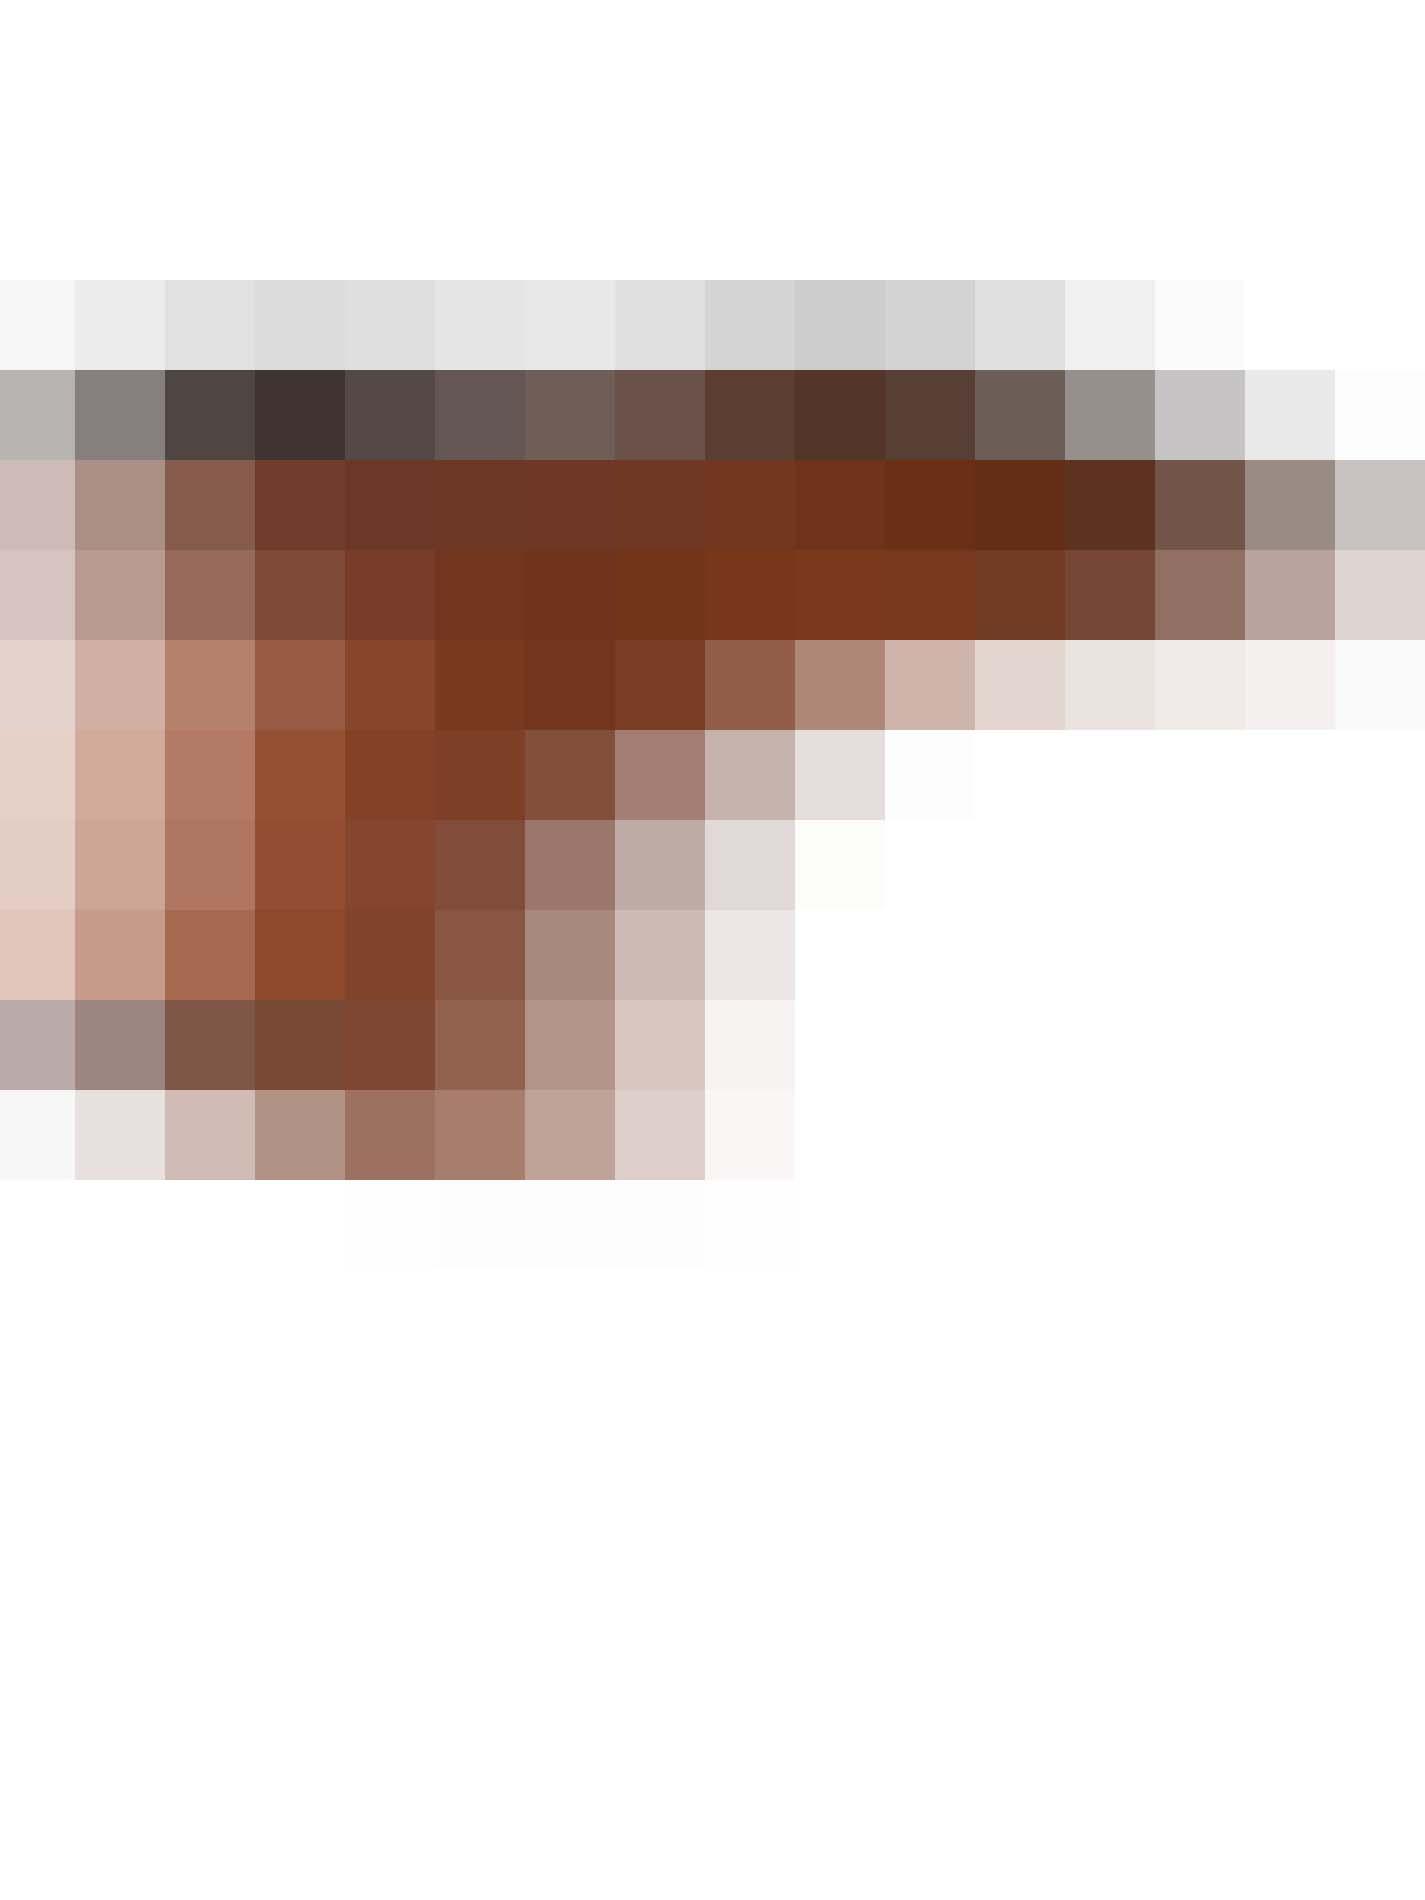 271298-0121_2